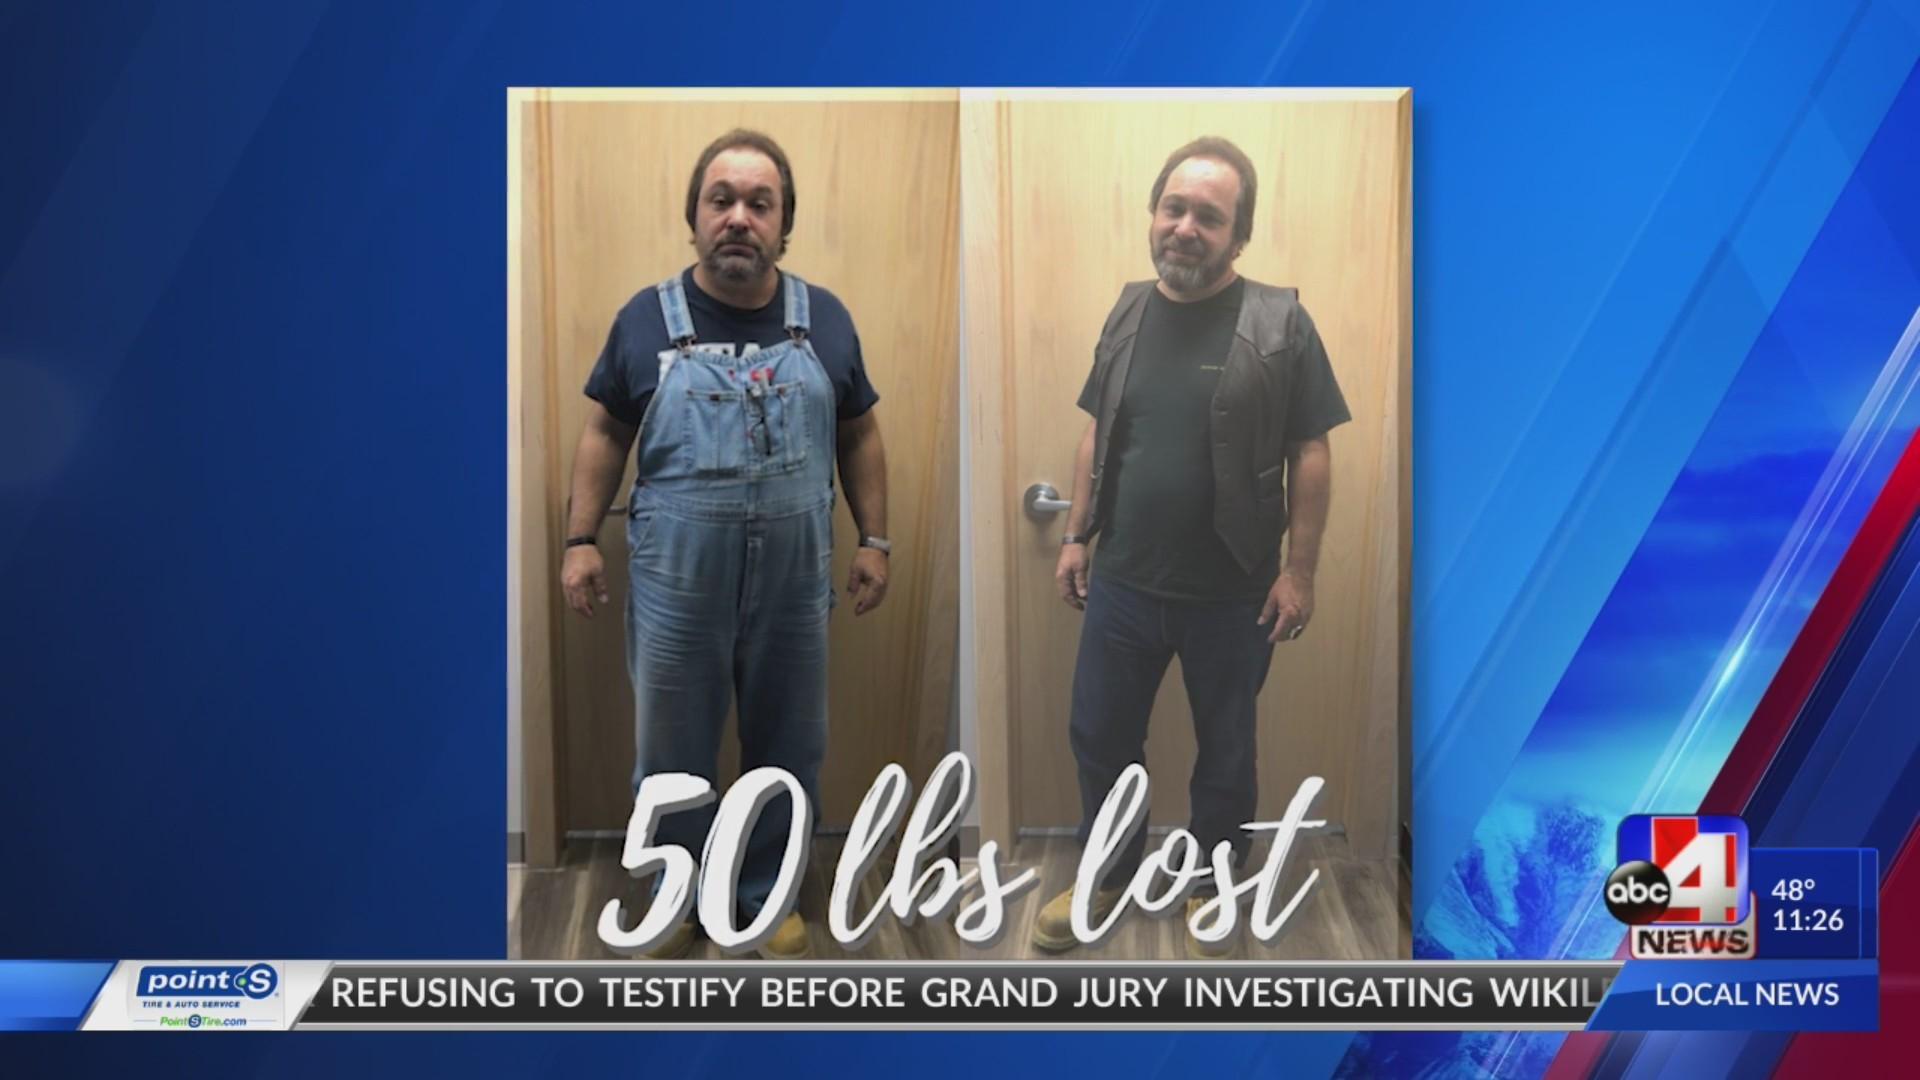 Natural approach, no tricks weight loss approach